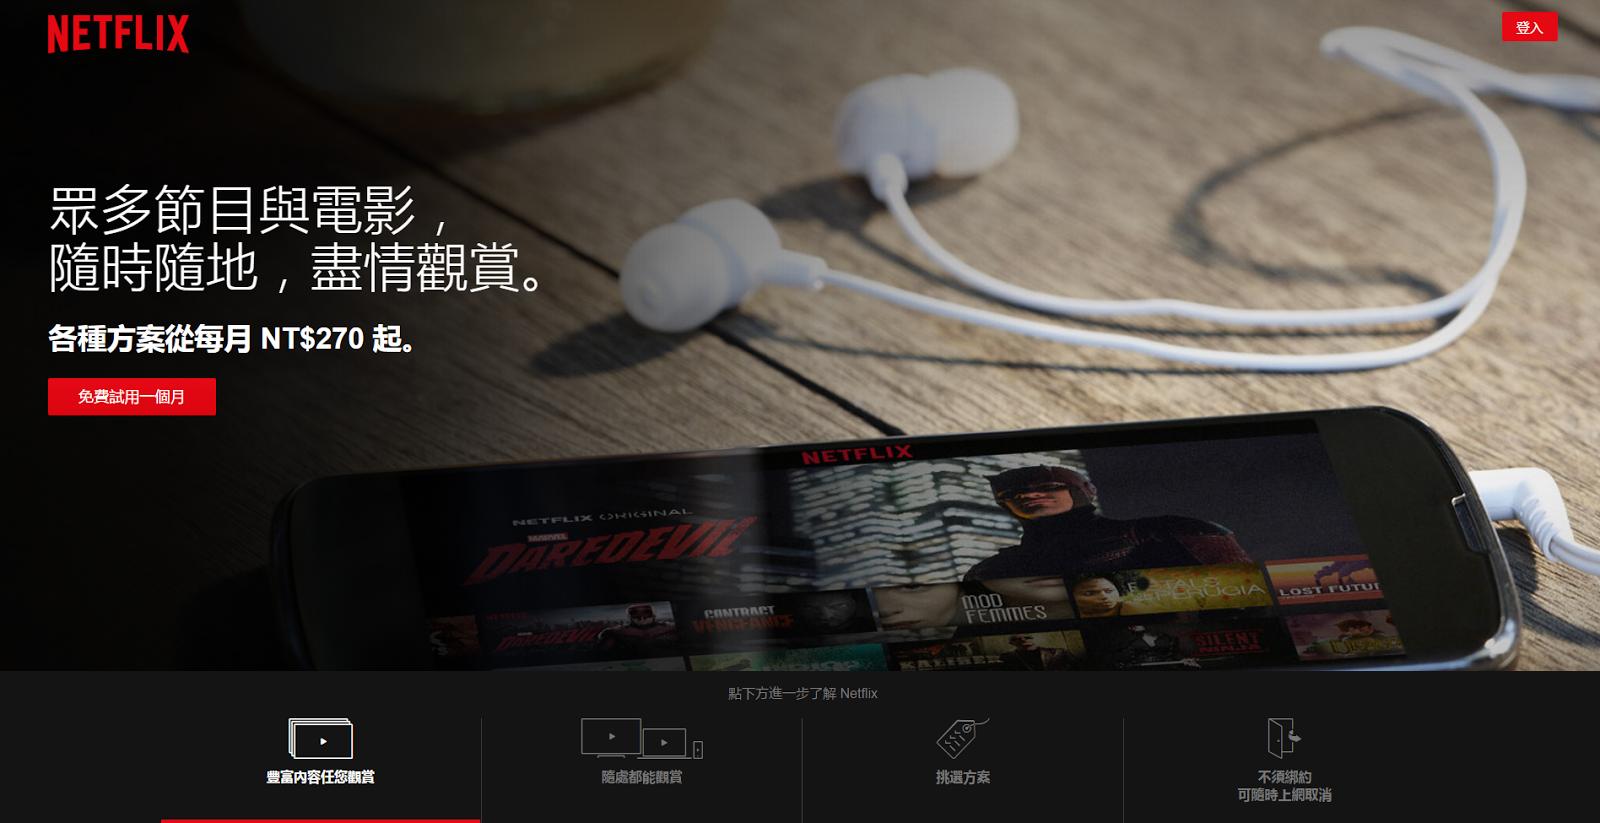 Netflix 台灣推出免費試看一個月,影集價格心得分享